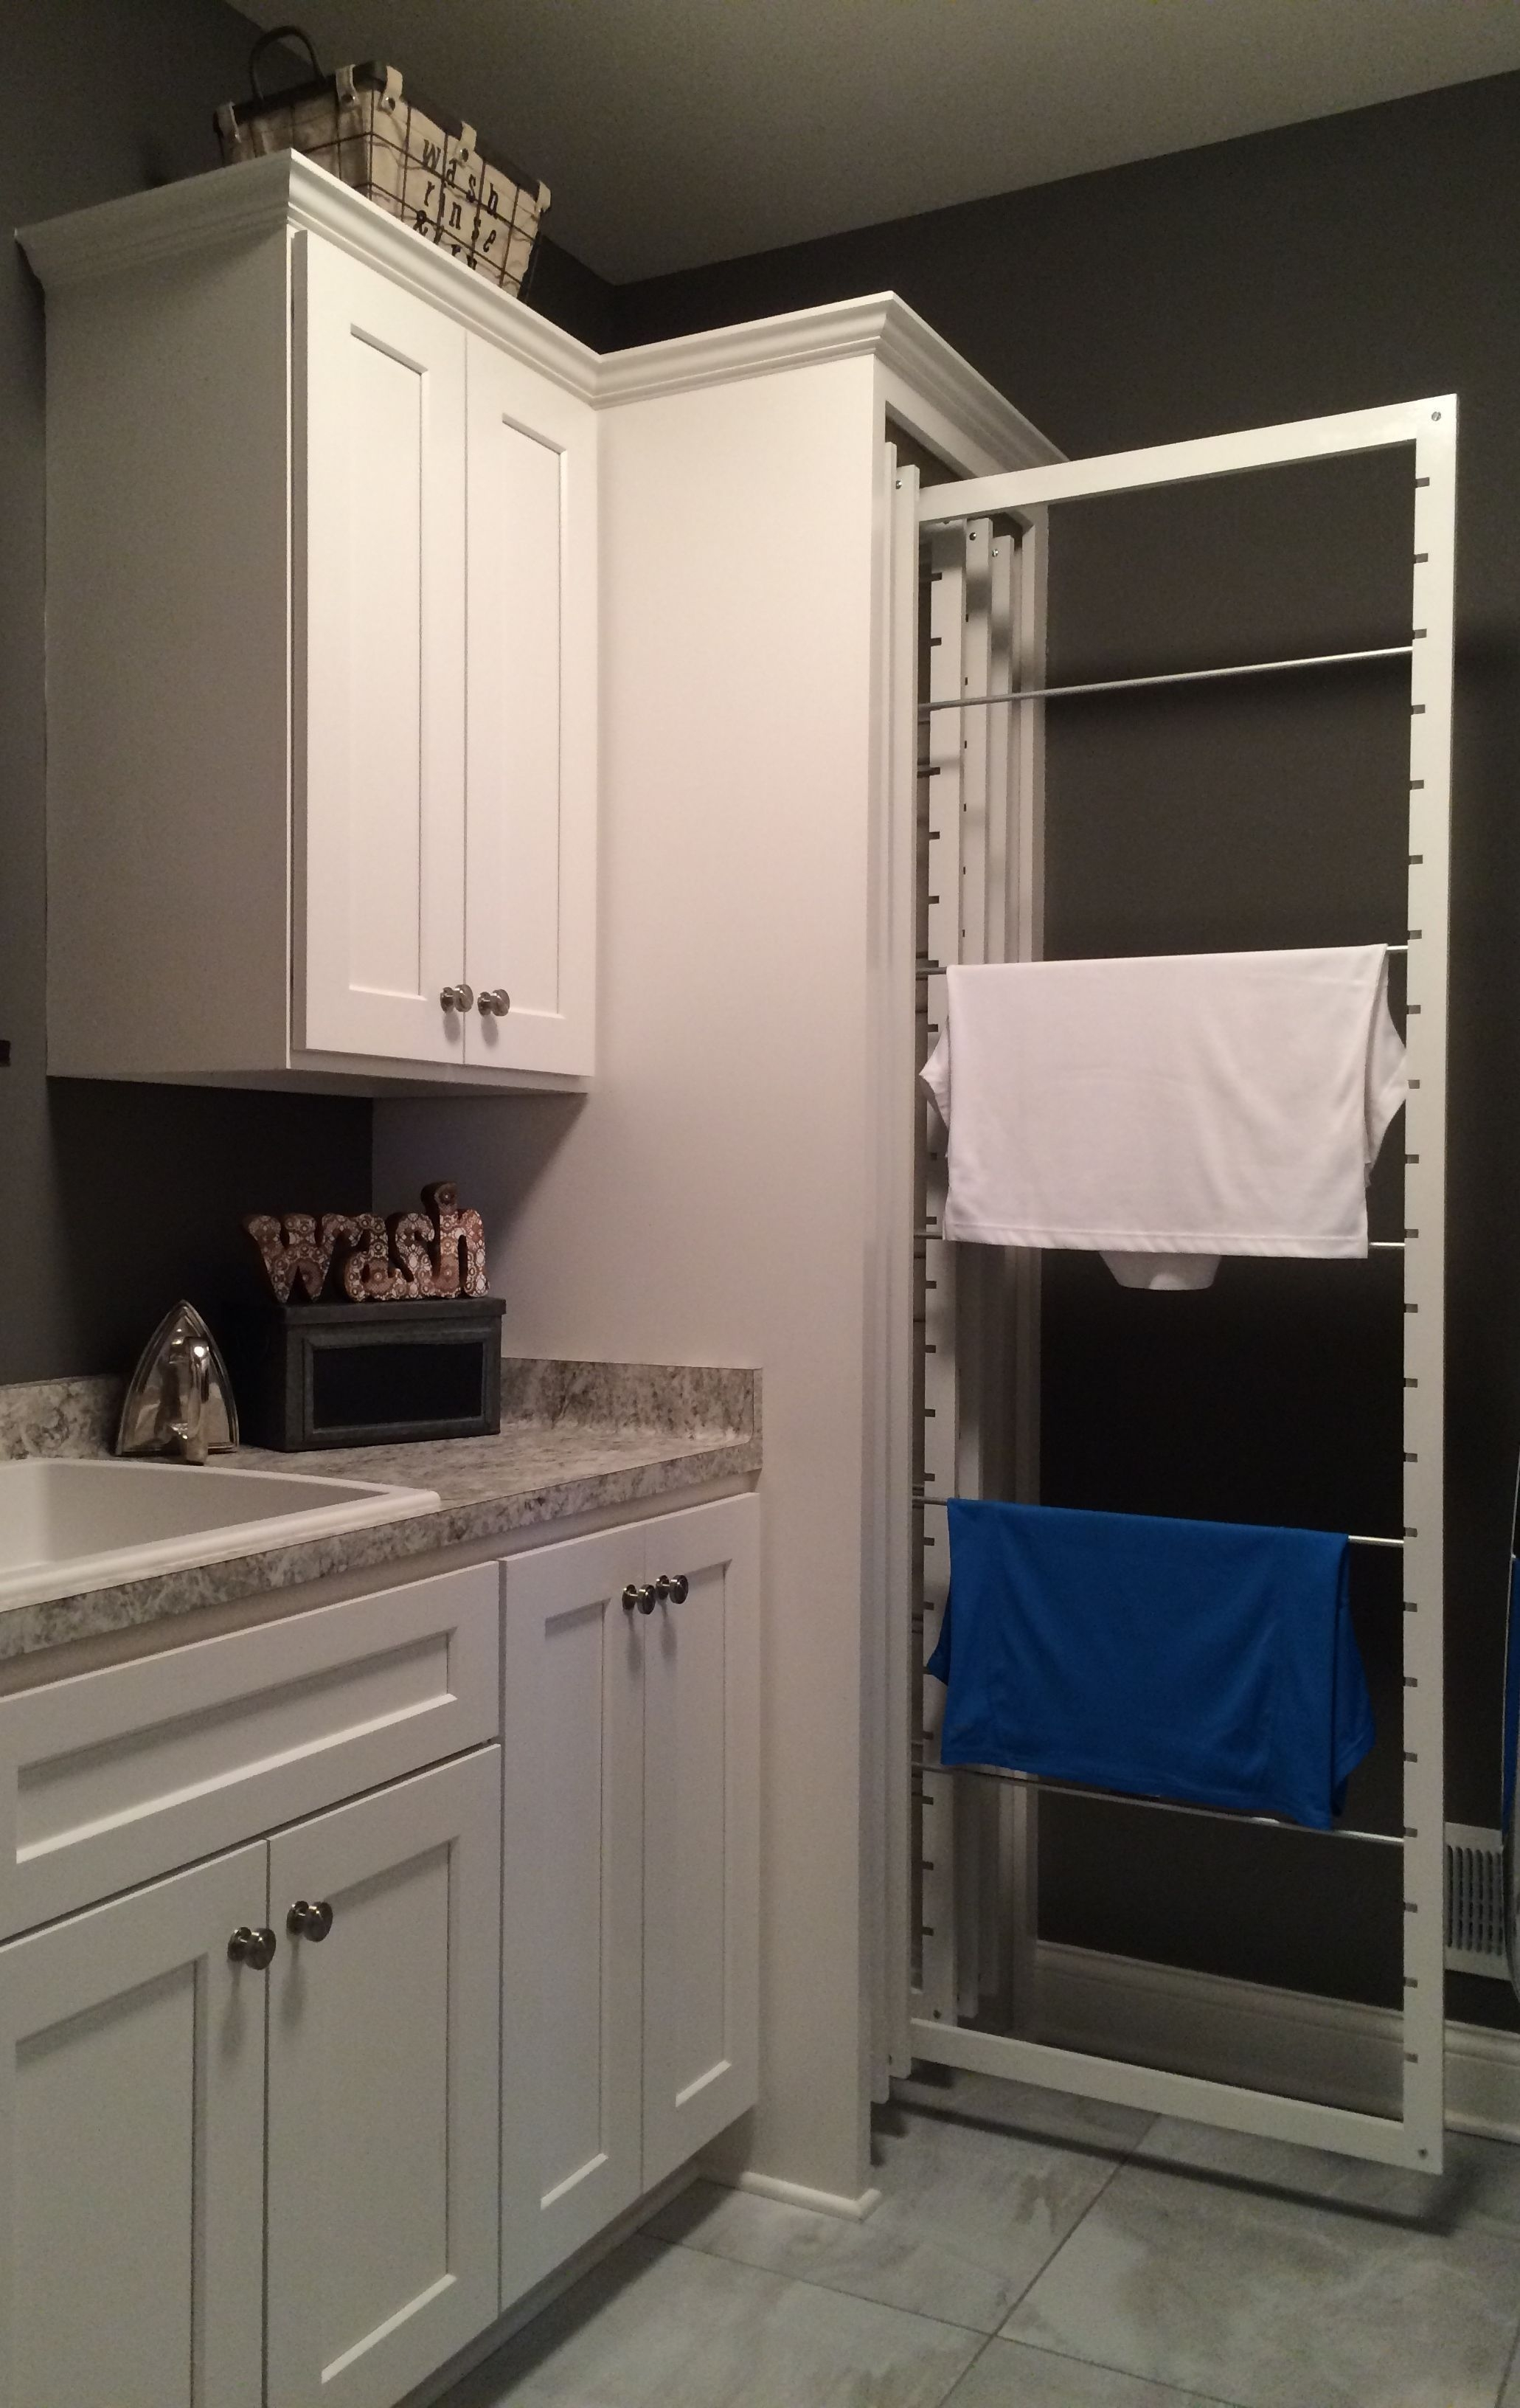 Cozy Laundry Room Storage Design Ideas 35